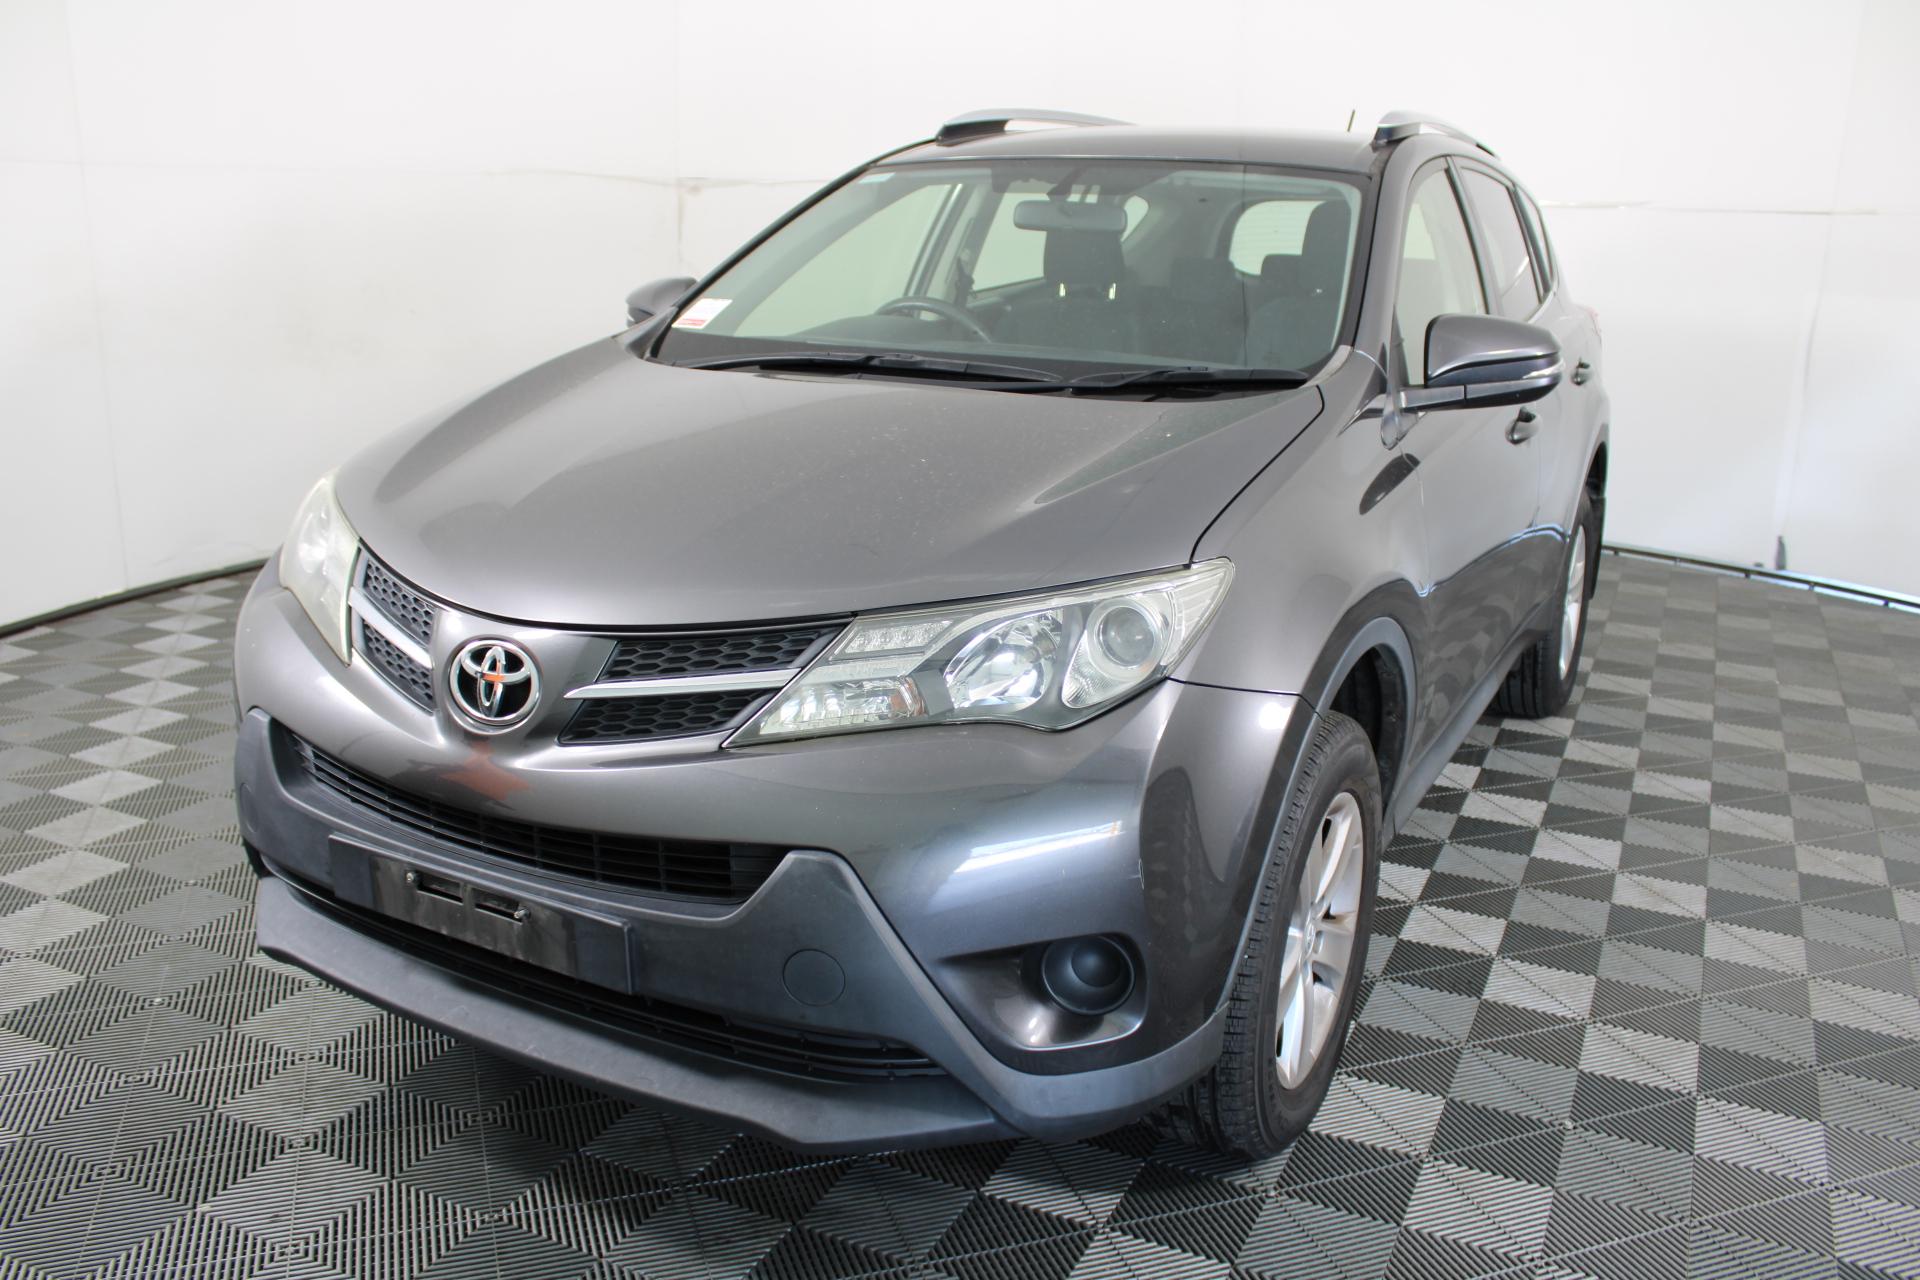 2013 Toyota Rav 4 Automatic 2.0 SUV ( 158,911 km's )